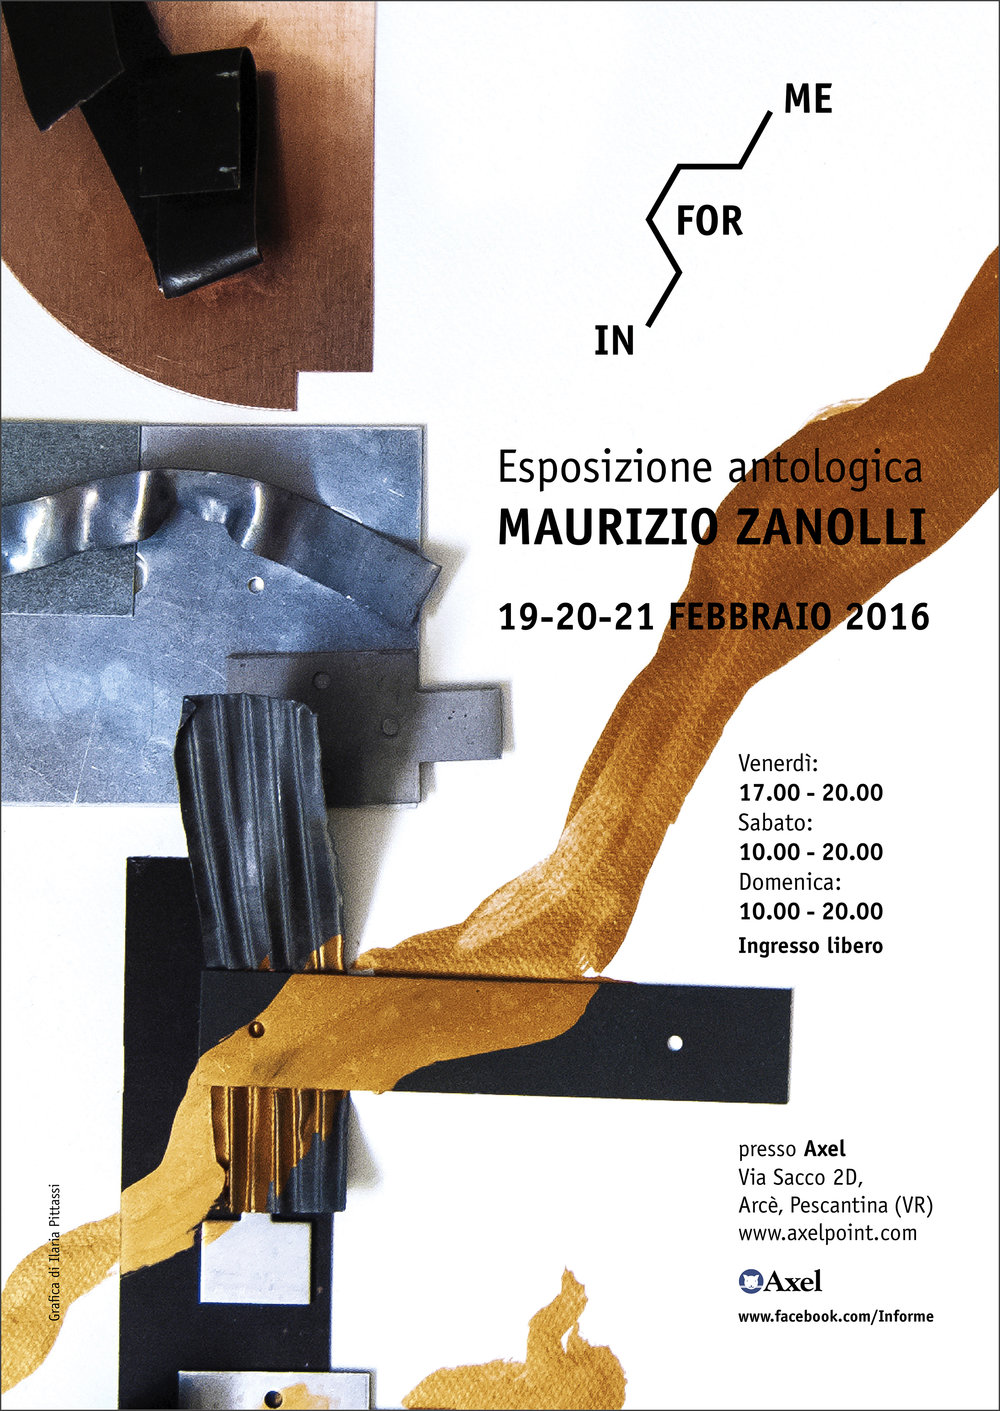 Antologica su Maurizio Zanolli